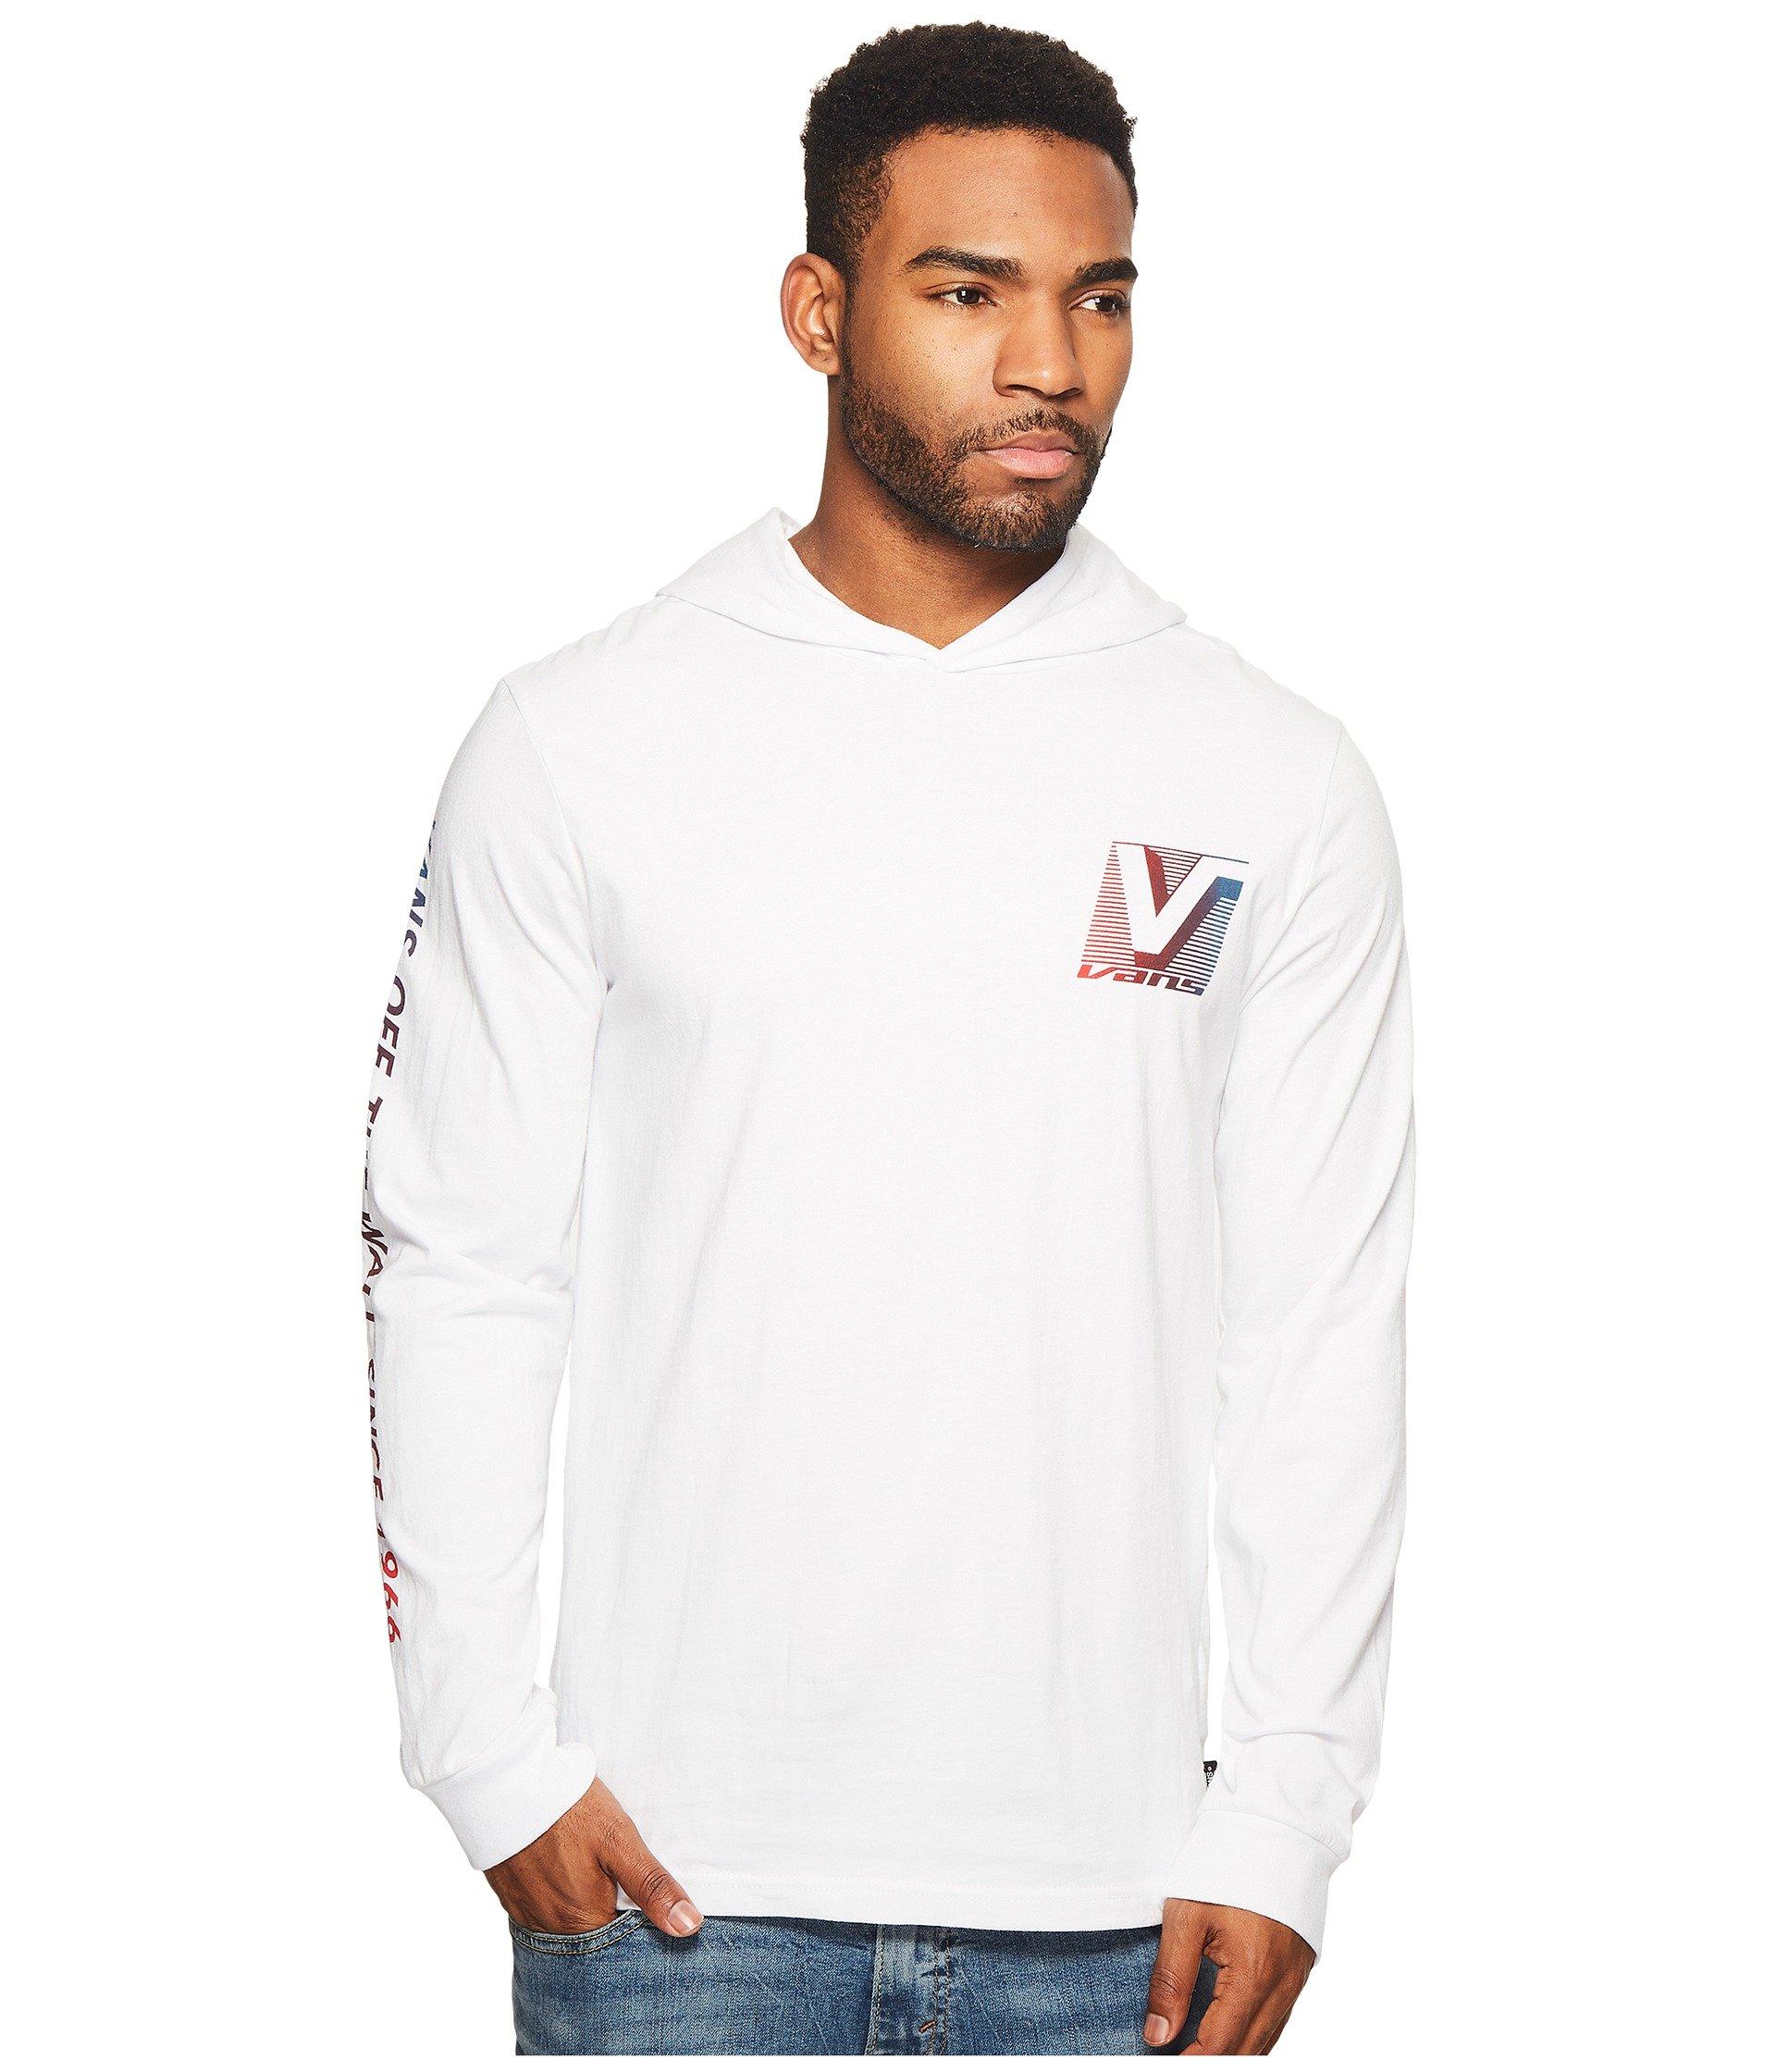 Buzo o Chaqueta Deportiva para Hombre Vans Van Doren Hooded Knit  + Vans en VeoyCompro.net